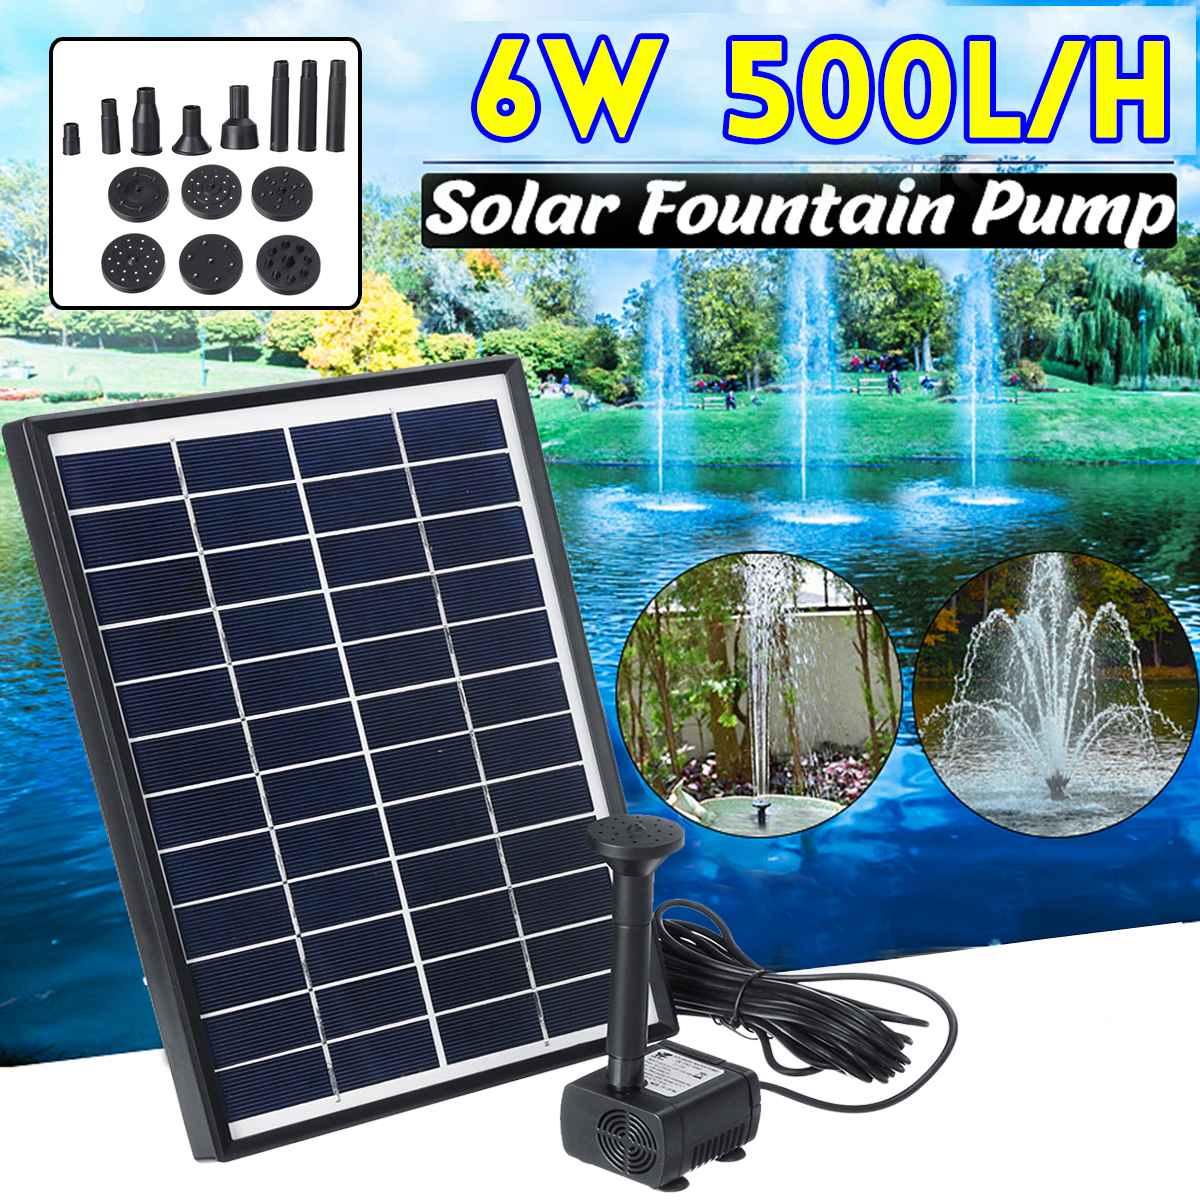 6W 500L/H Solar Power Panel Water Pump Garden Landscape Floating Fountain Artificial Outdoor Fountain Home Decoration Pump Set